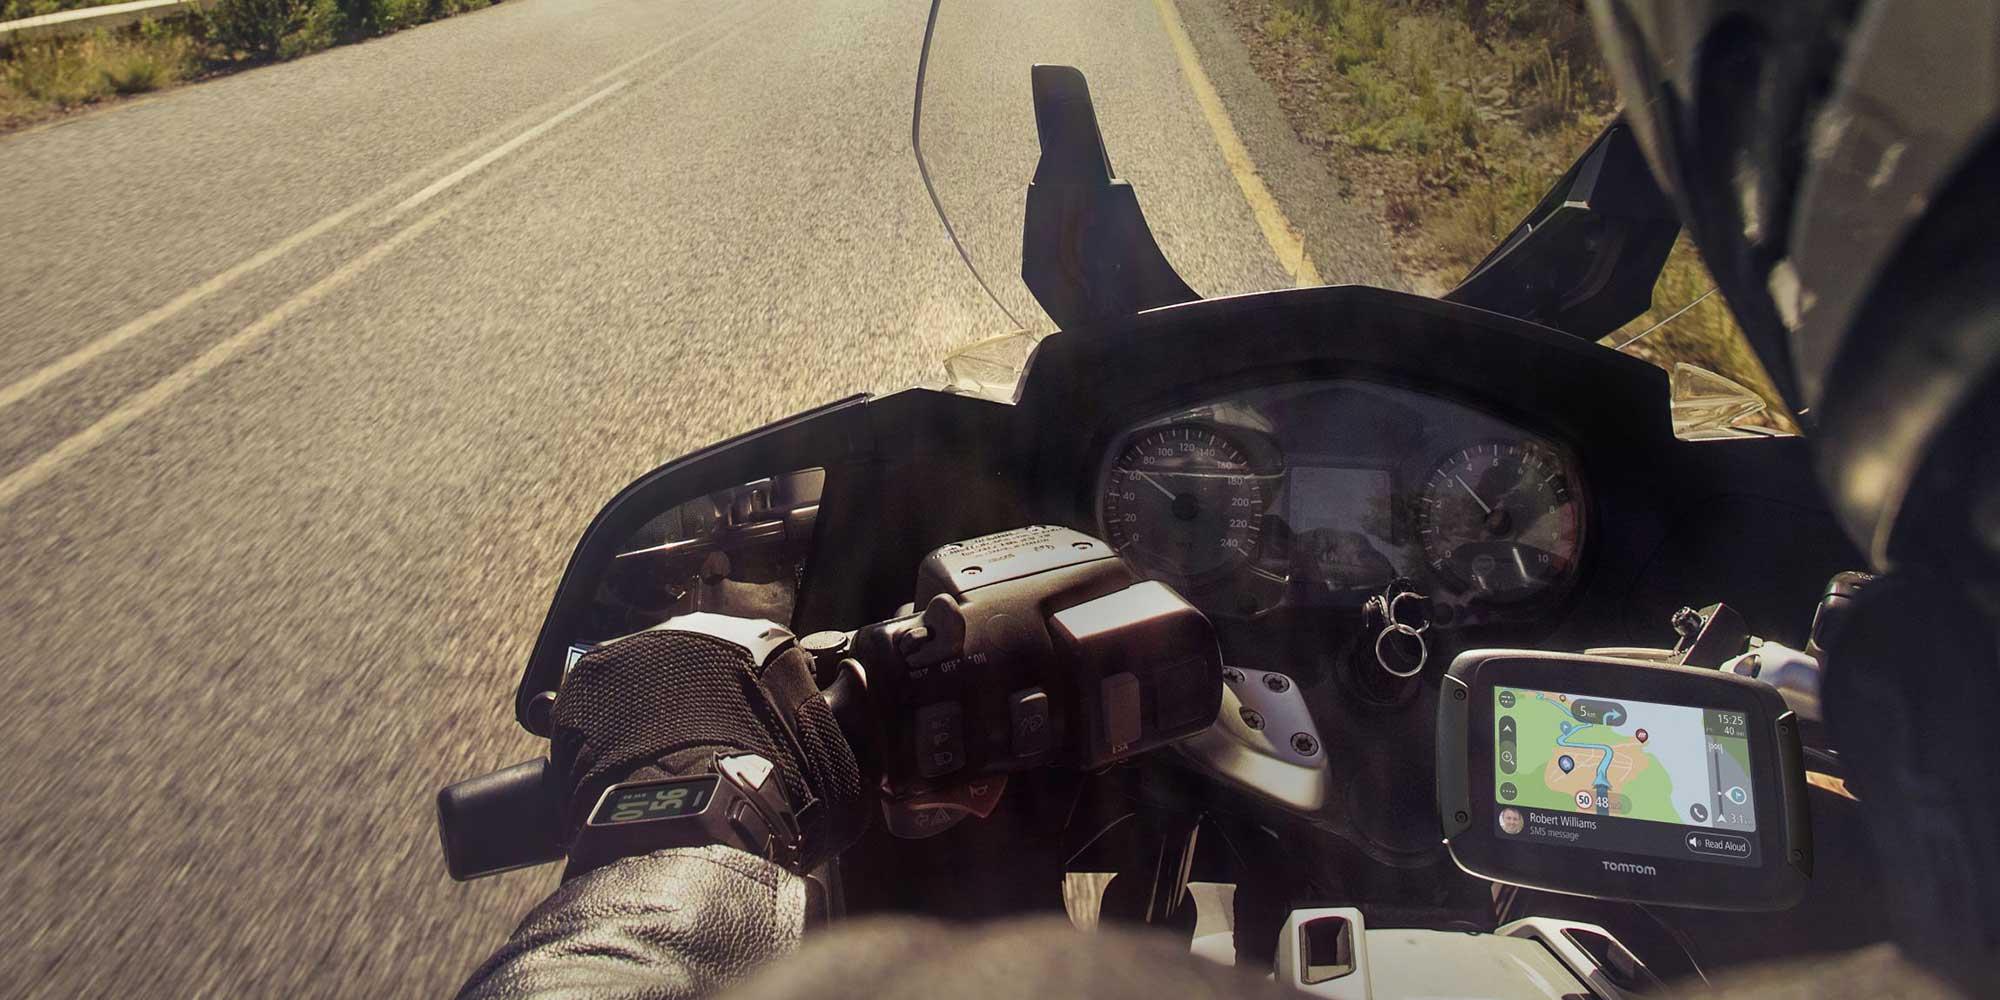 TomTom's New Rider 550 GPS